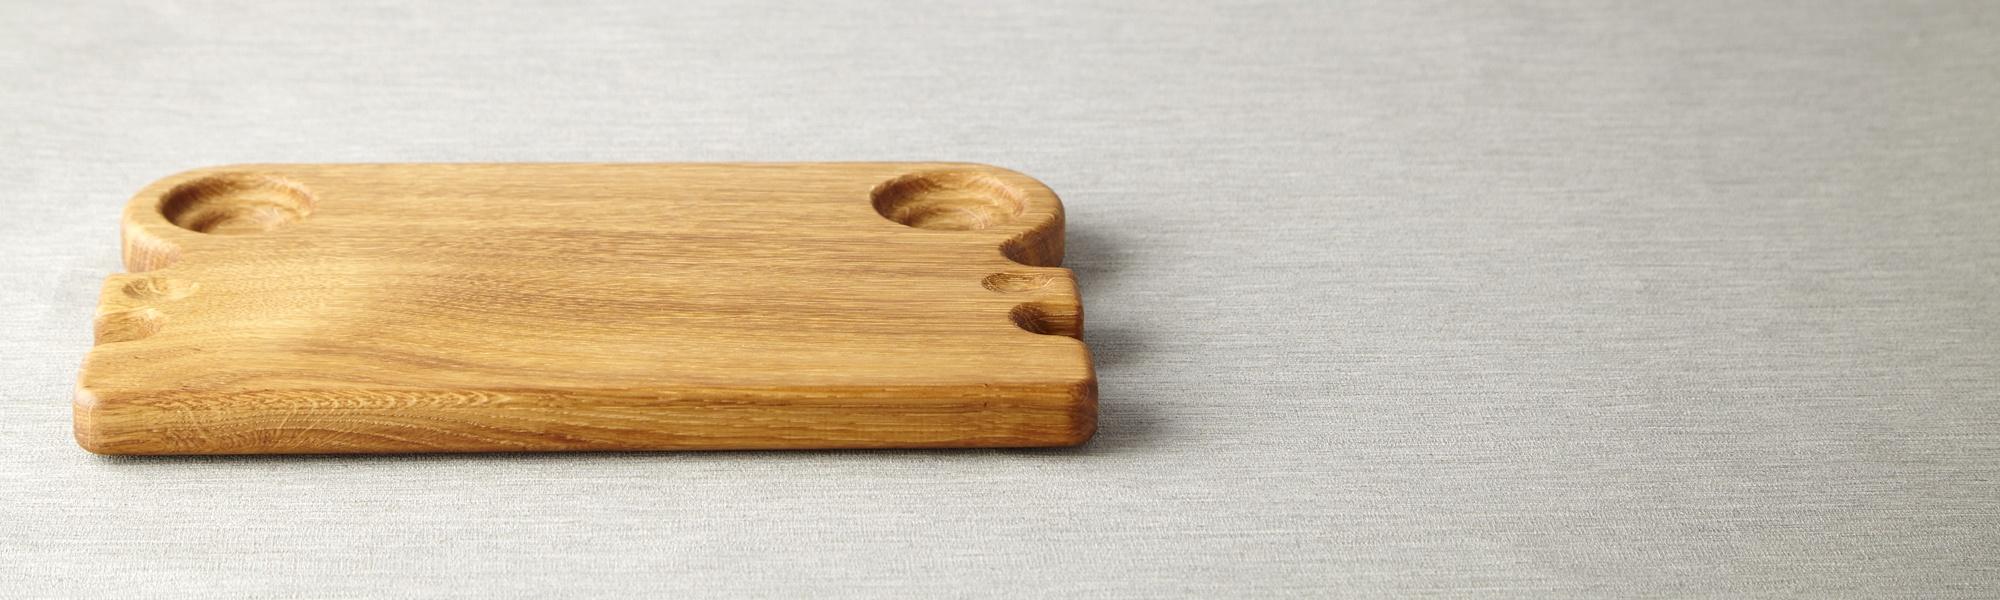 02. Cheeseboard Natural.jpg